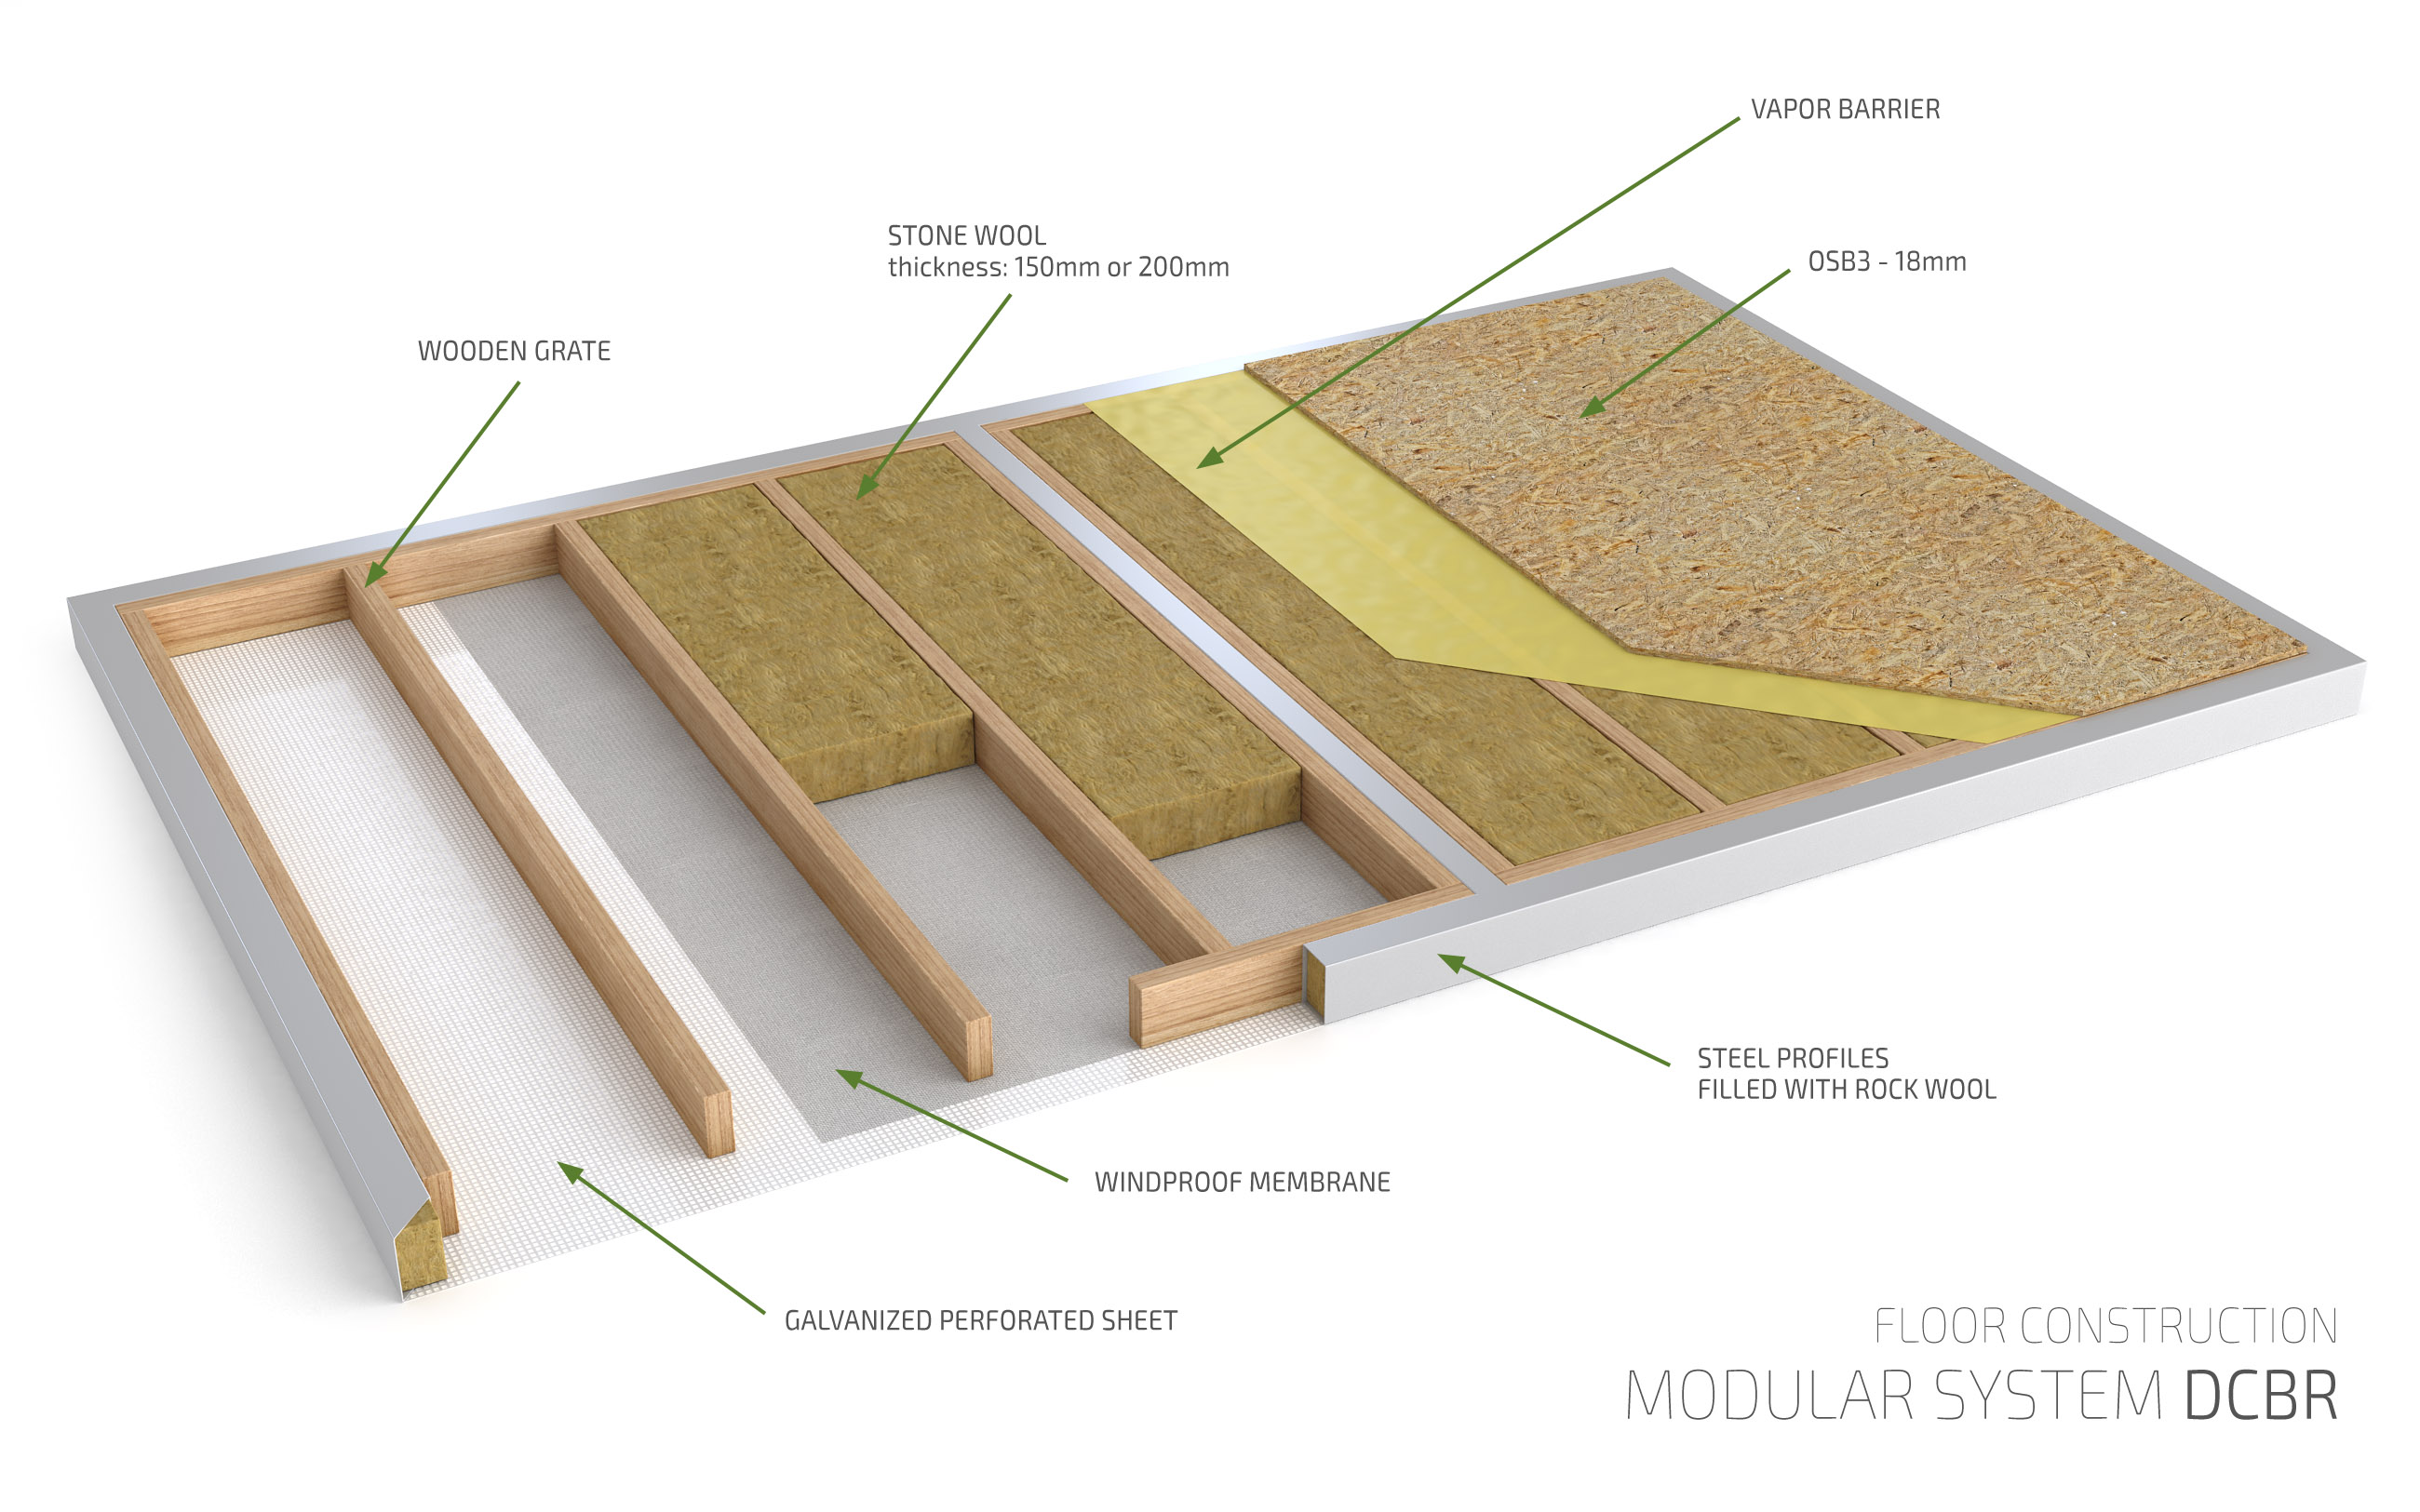 FLOOR CONSTRUCTION MODULAR SYSTEM DCBR